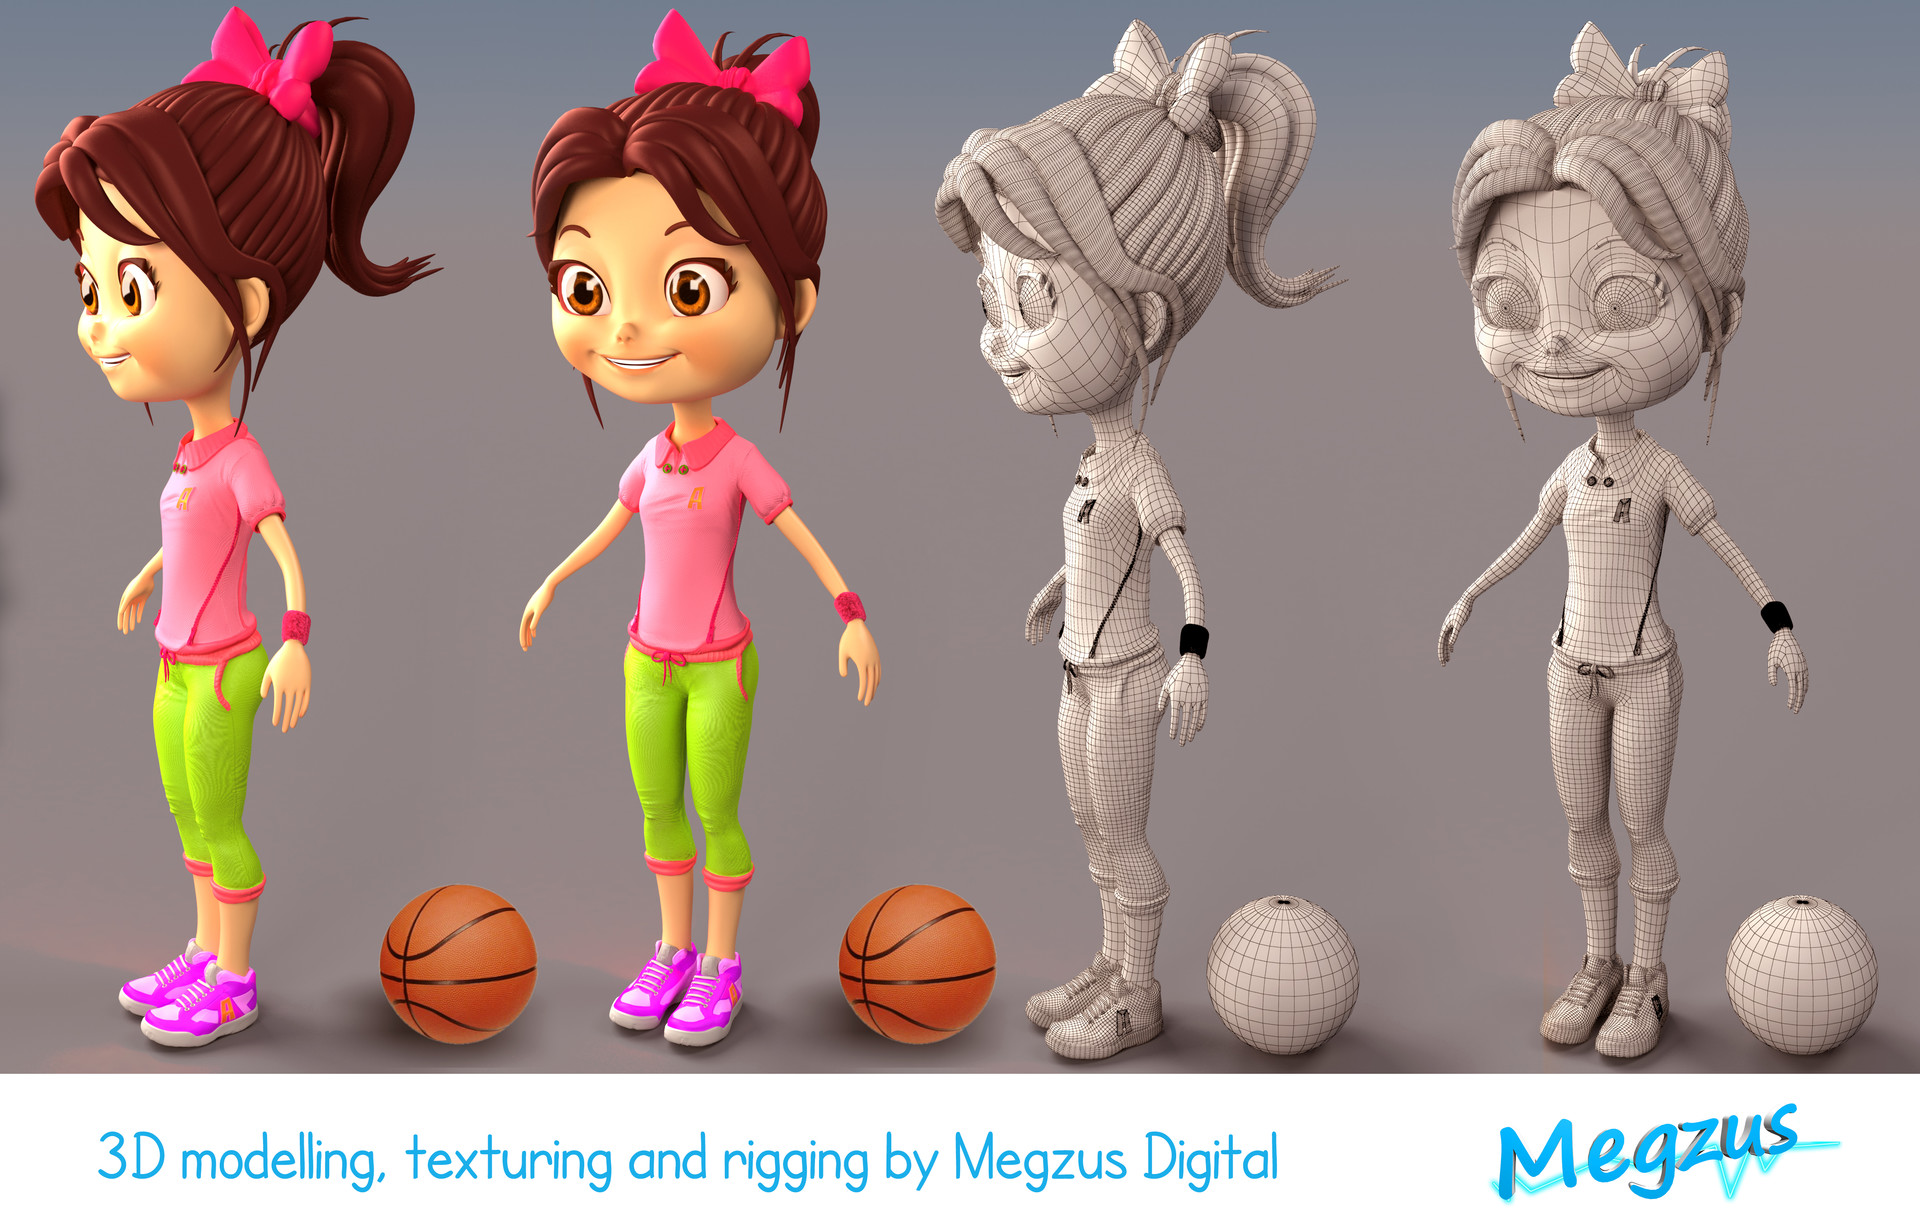 artstation 3d character for kids product branding megzus